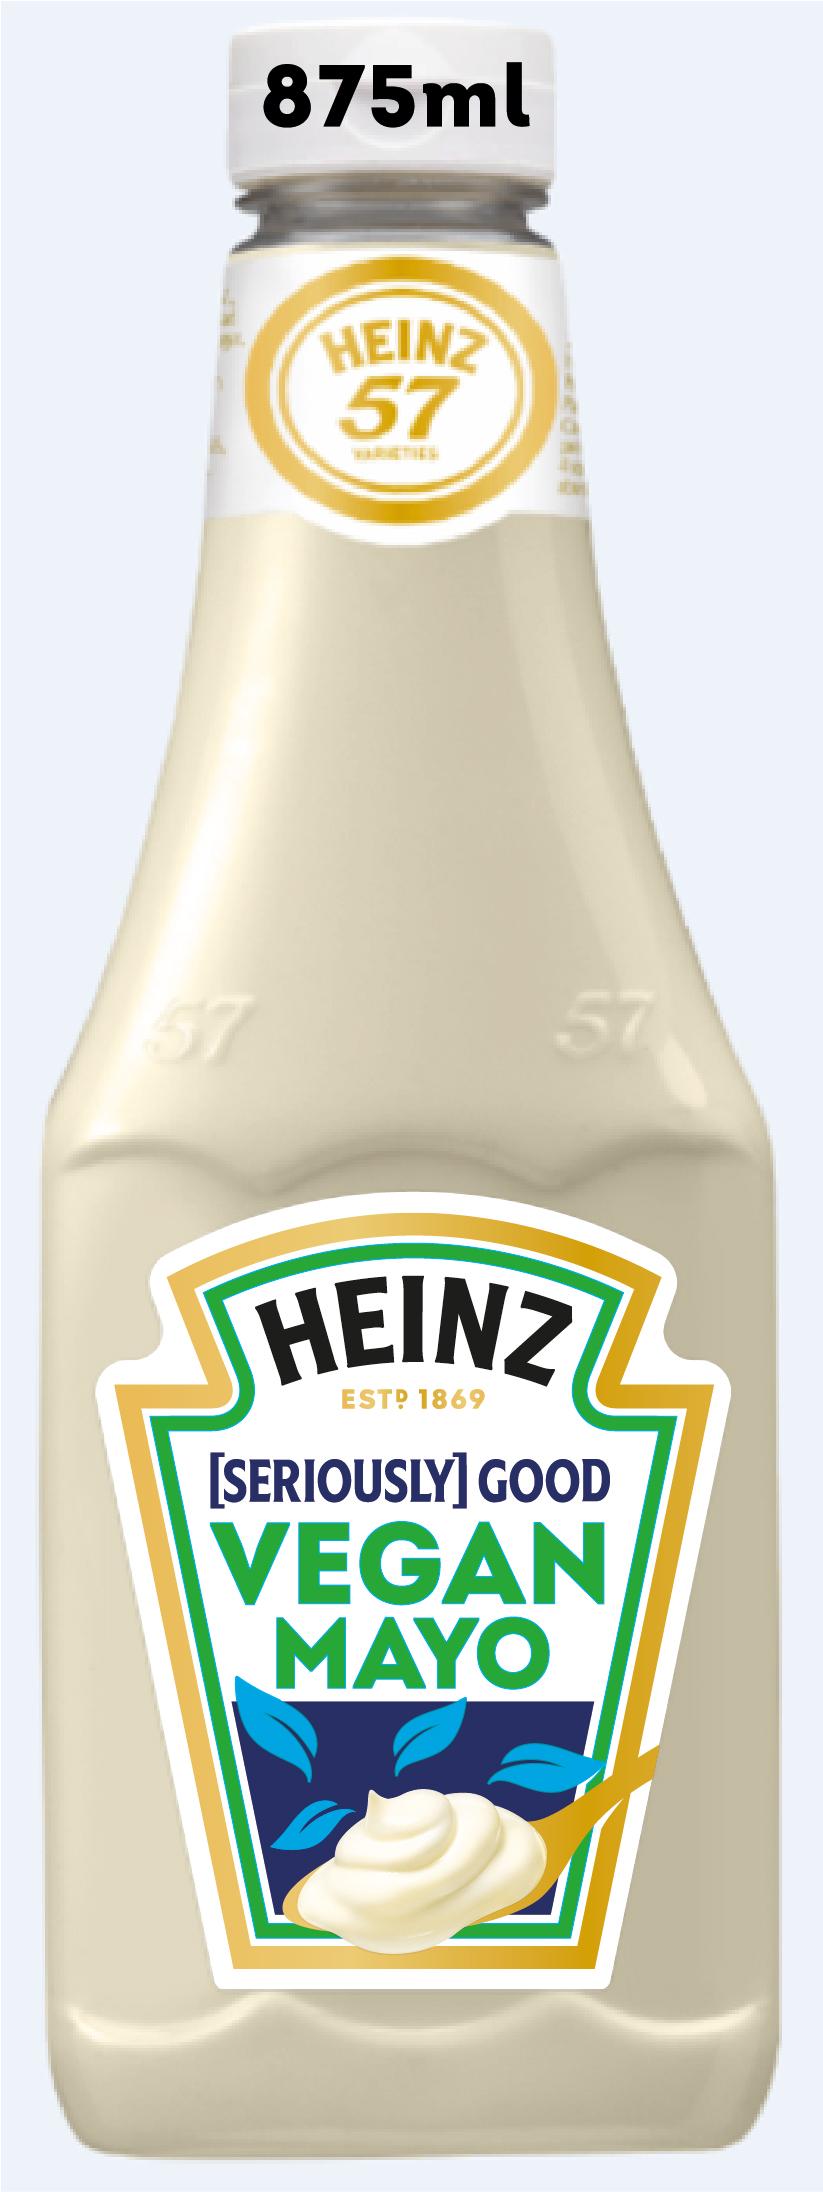 Heinz [Seriously] Good Vegan Mayo 875ml Bottom Up image